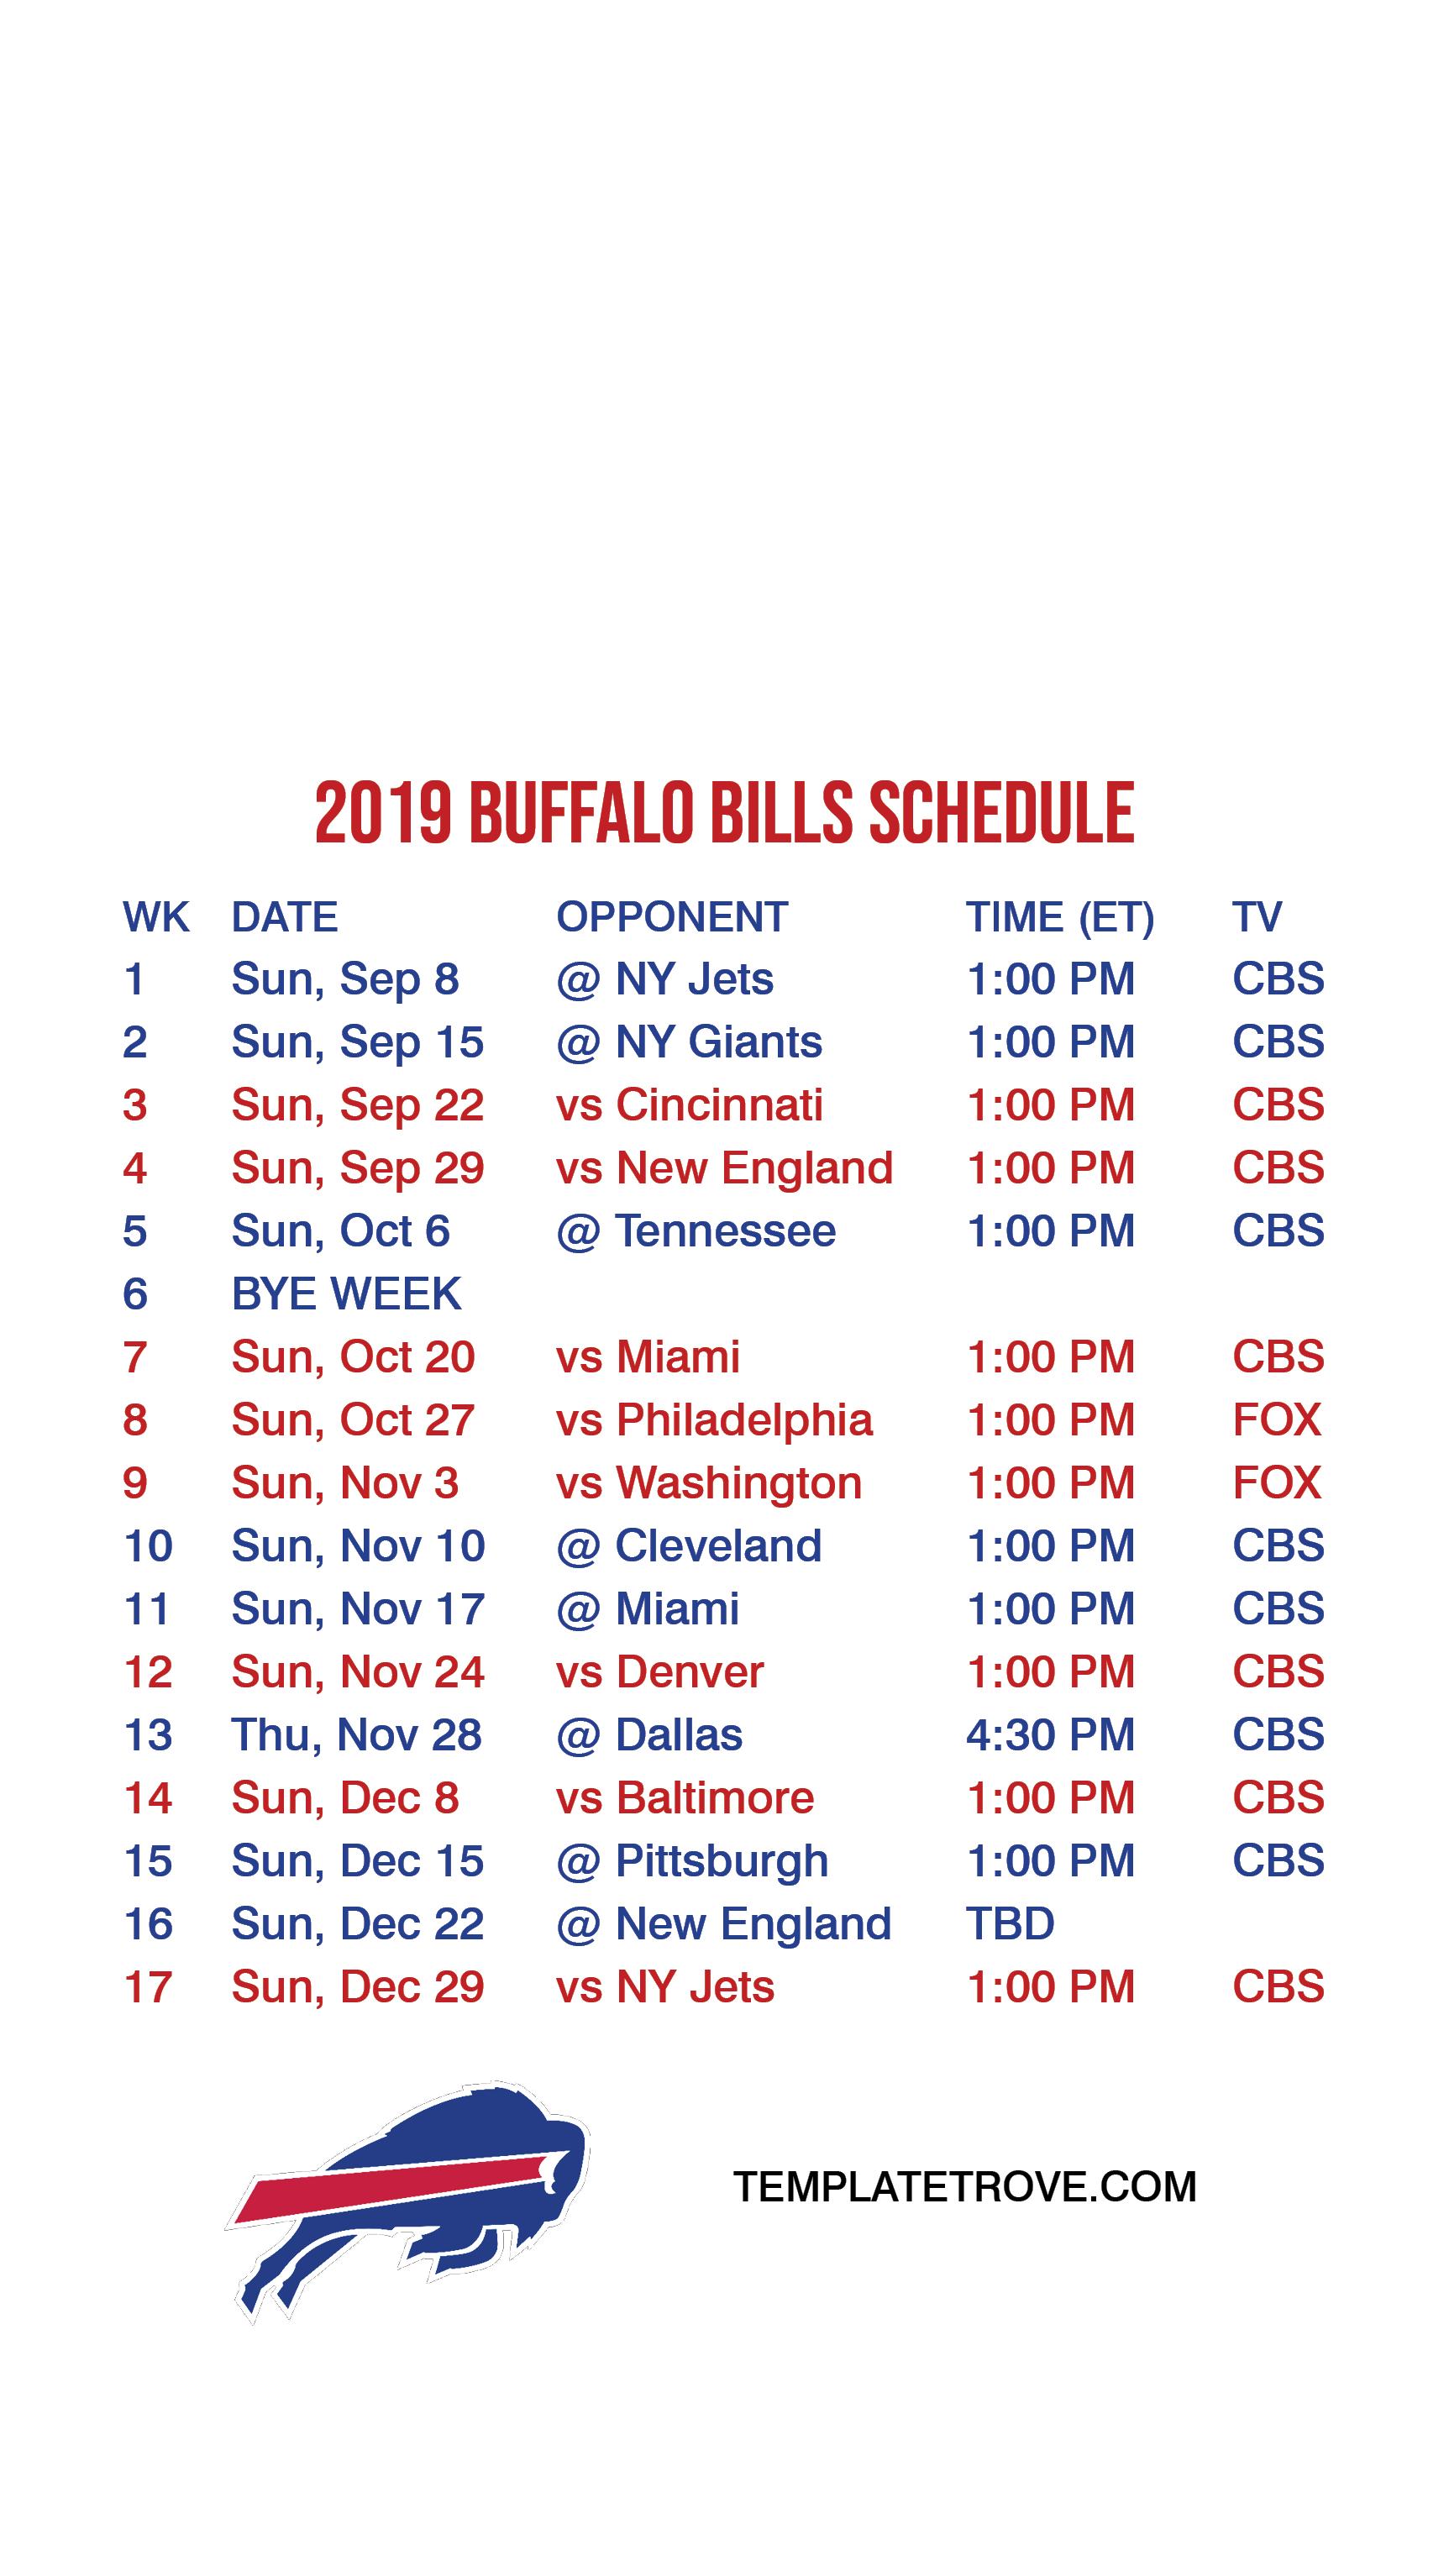 2019-2020 Buffalo Bills Lock Screen Schedule For Iphone 6-7